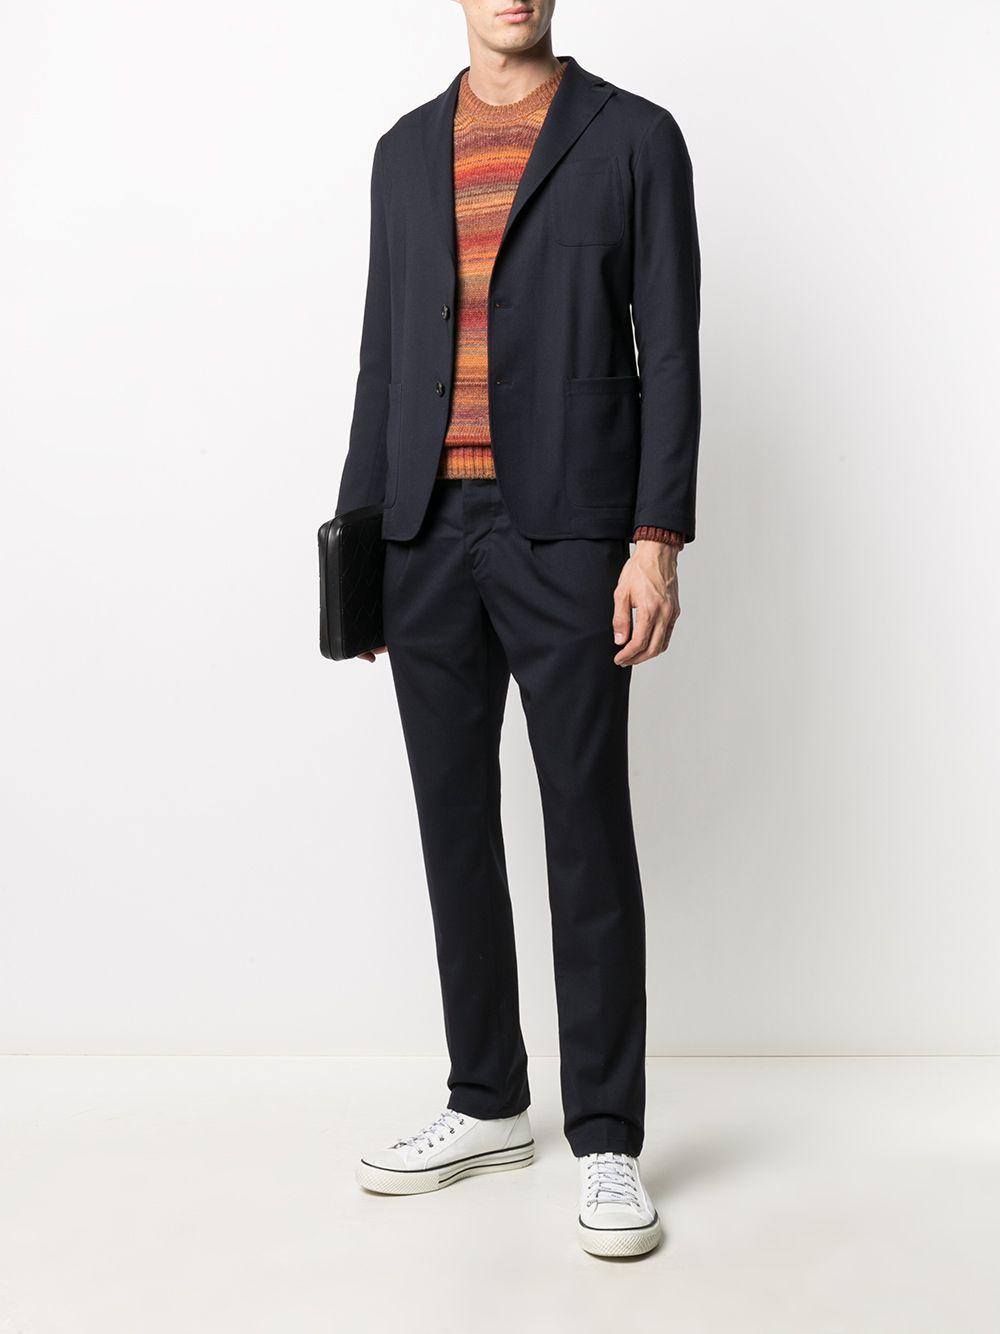 brown,orange and red virgin wool-blend crew neck stripe-ombré sweater  ALTEA |  | 206128263